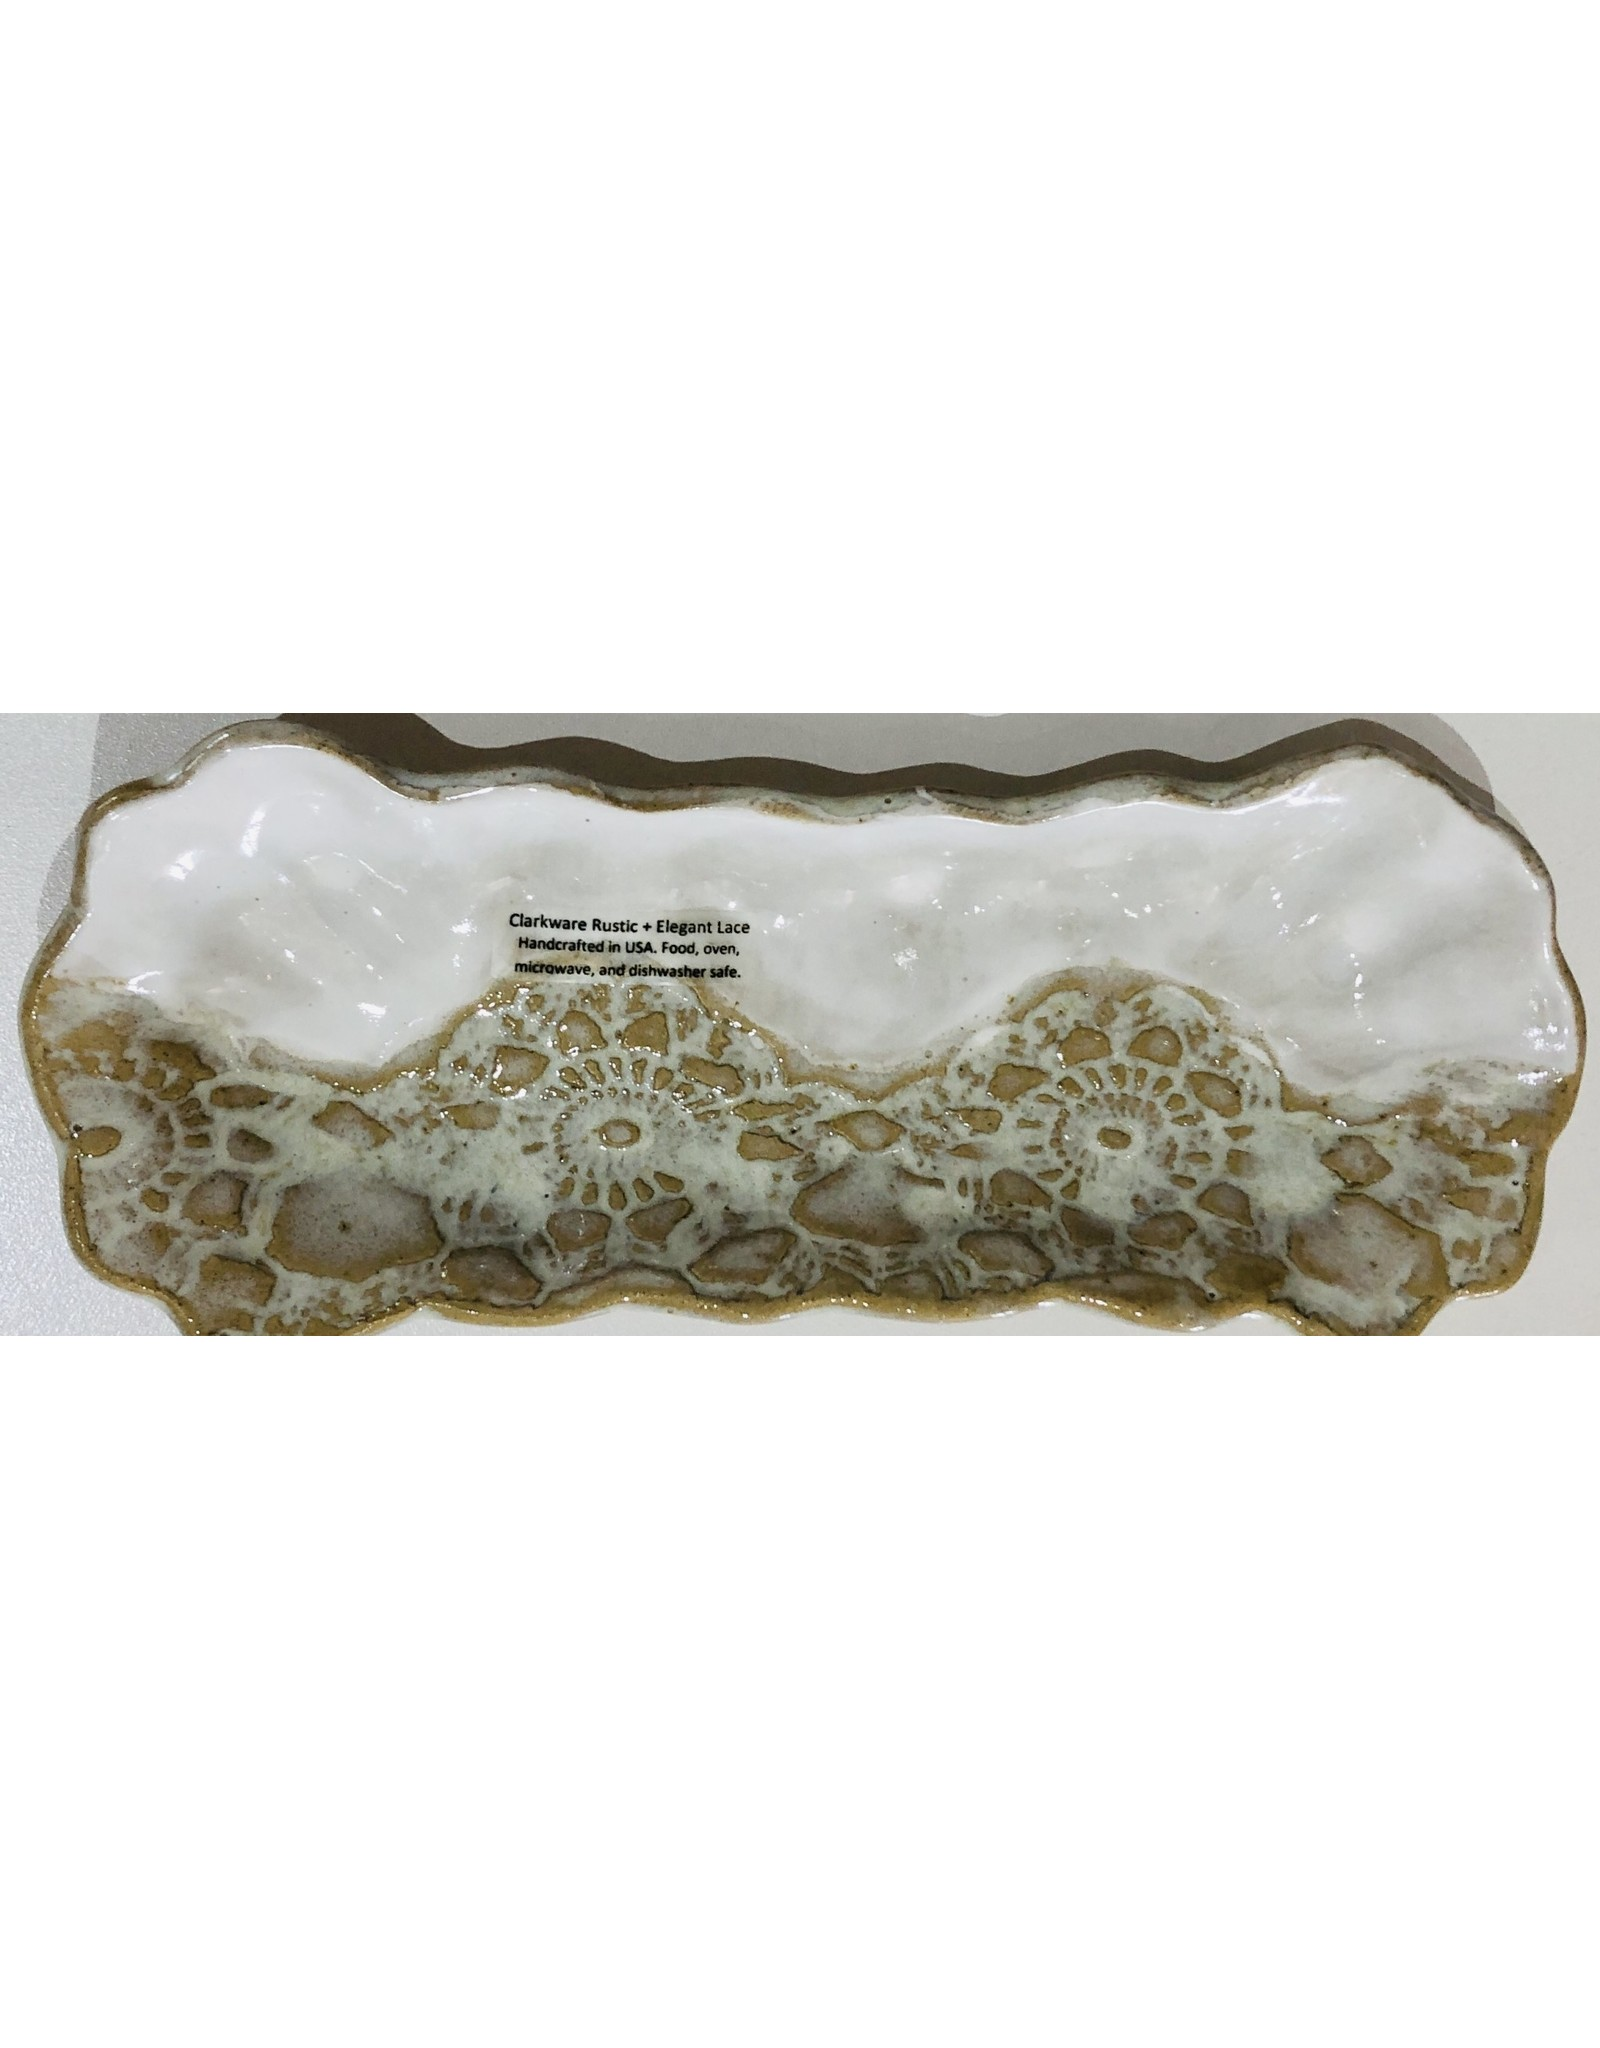 "Clarkware Pottery PICKLE TRAY, Elegant Lace, 9.5x4"", CLARK"